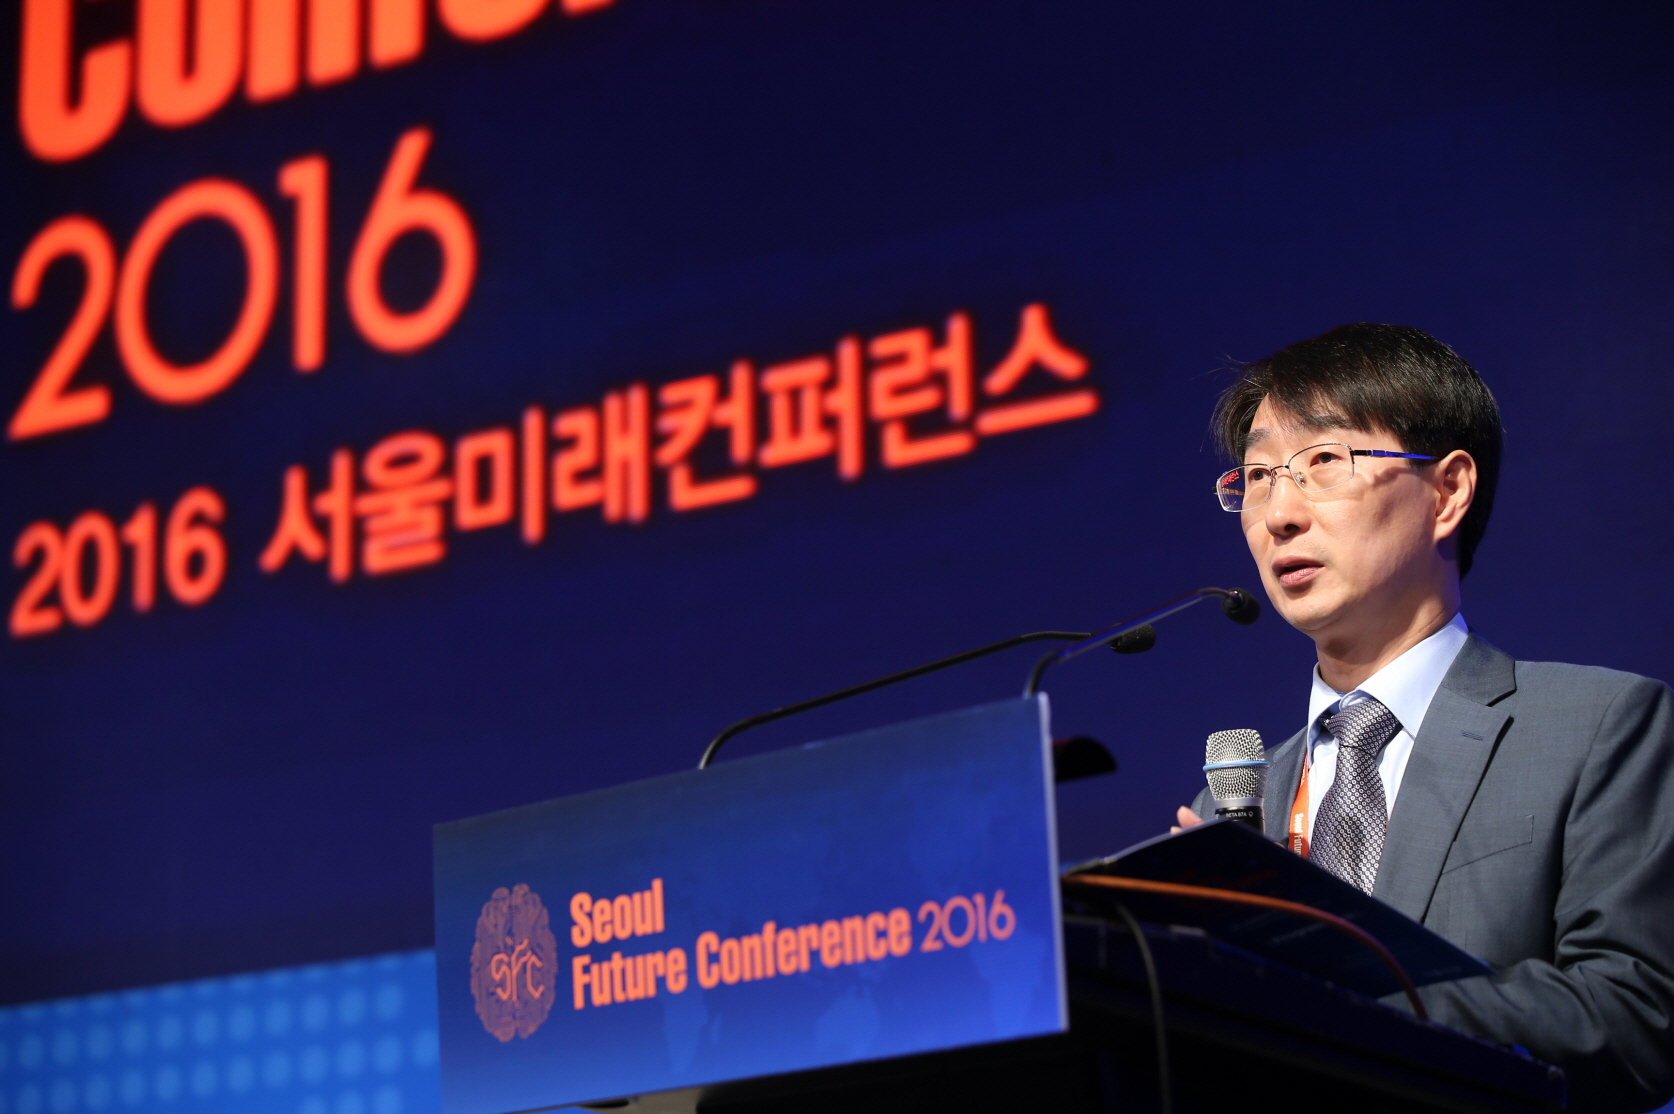 2016 SFC Session I 김정환 산업통상자원부 시스템산업정책관